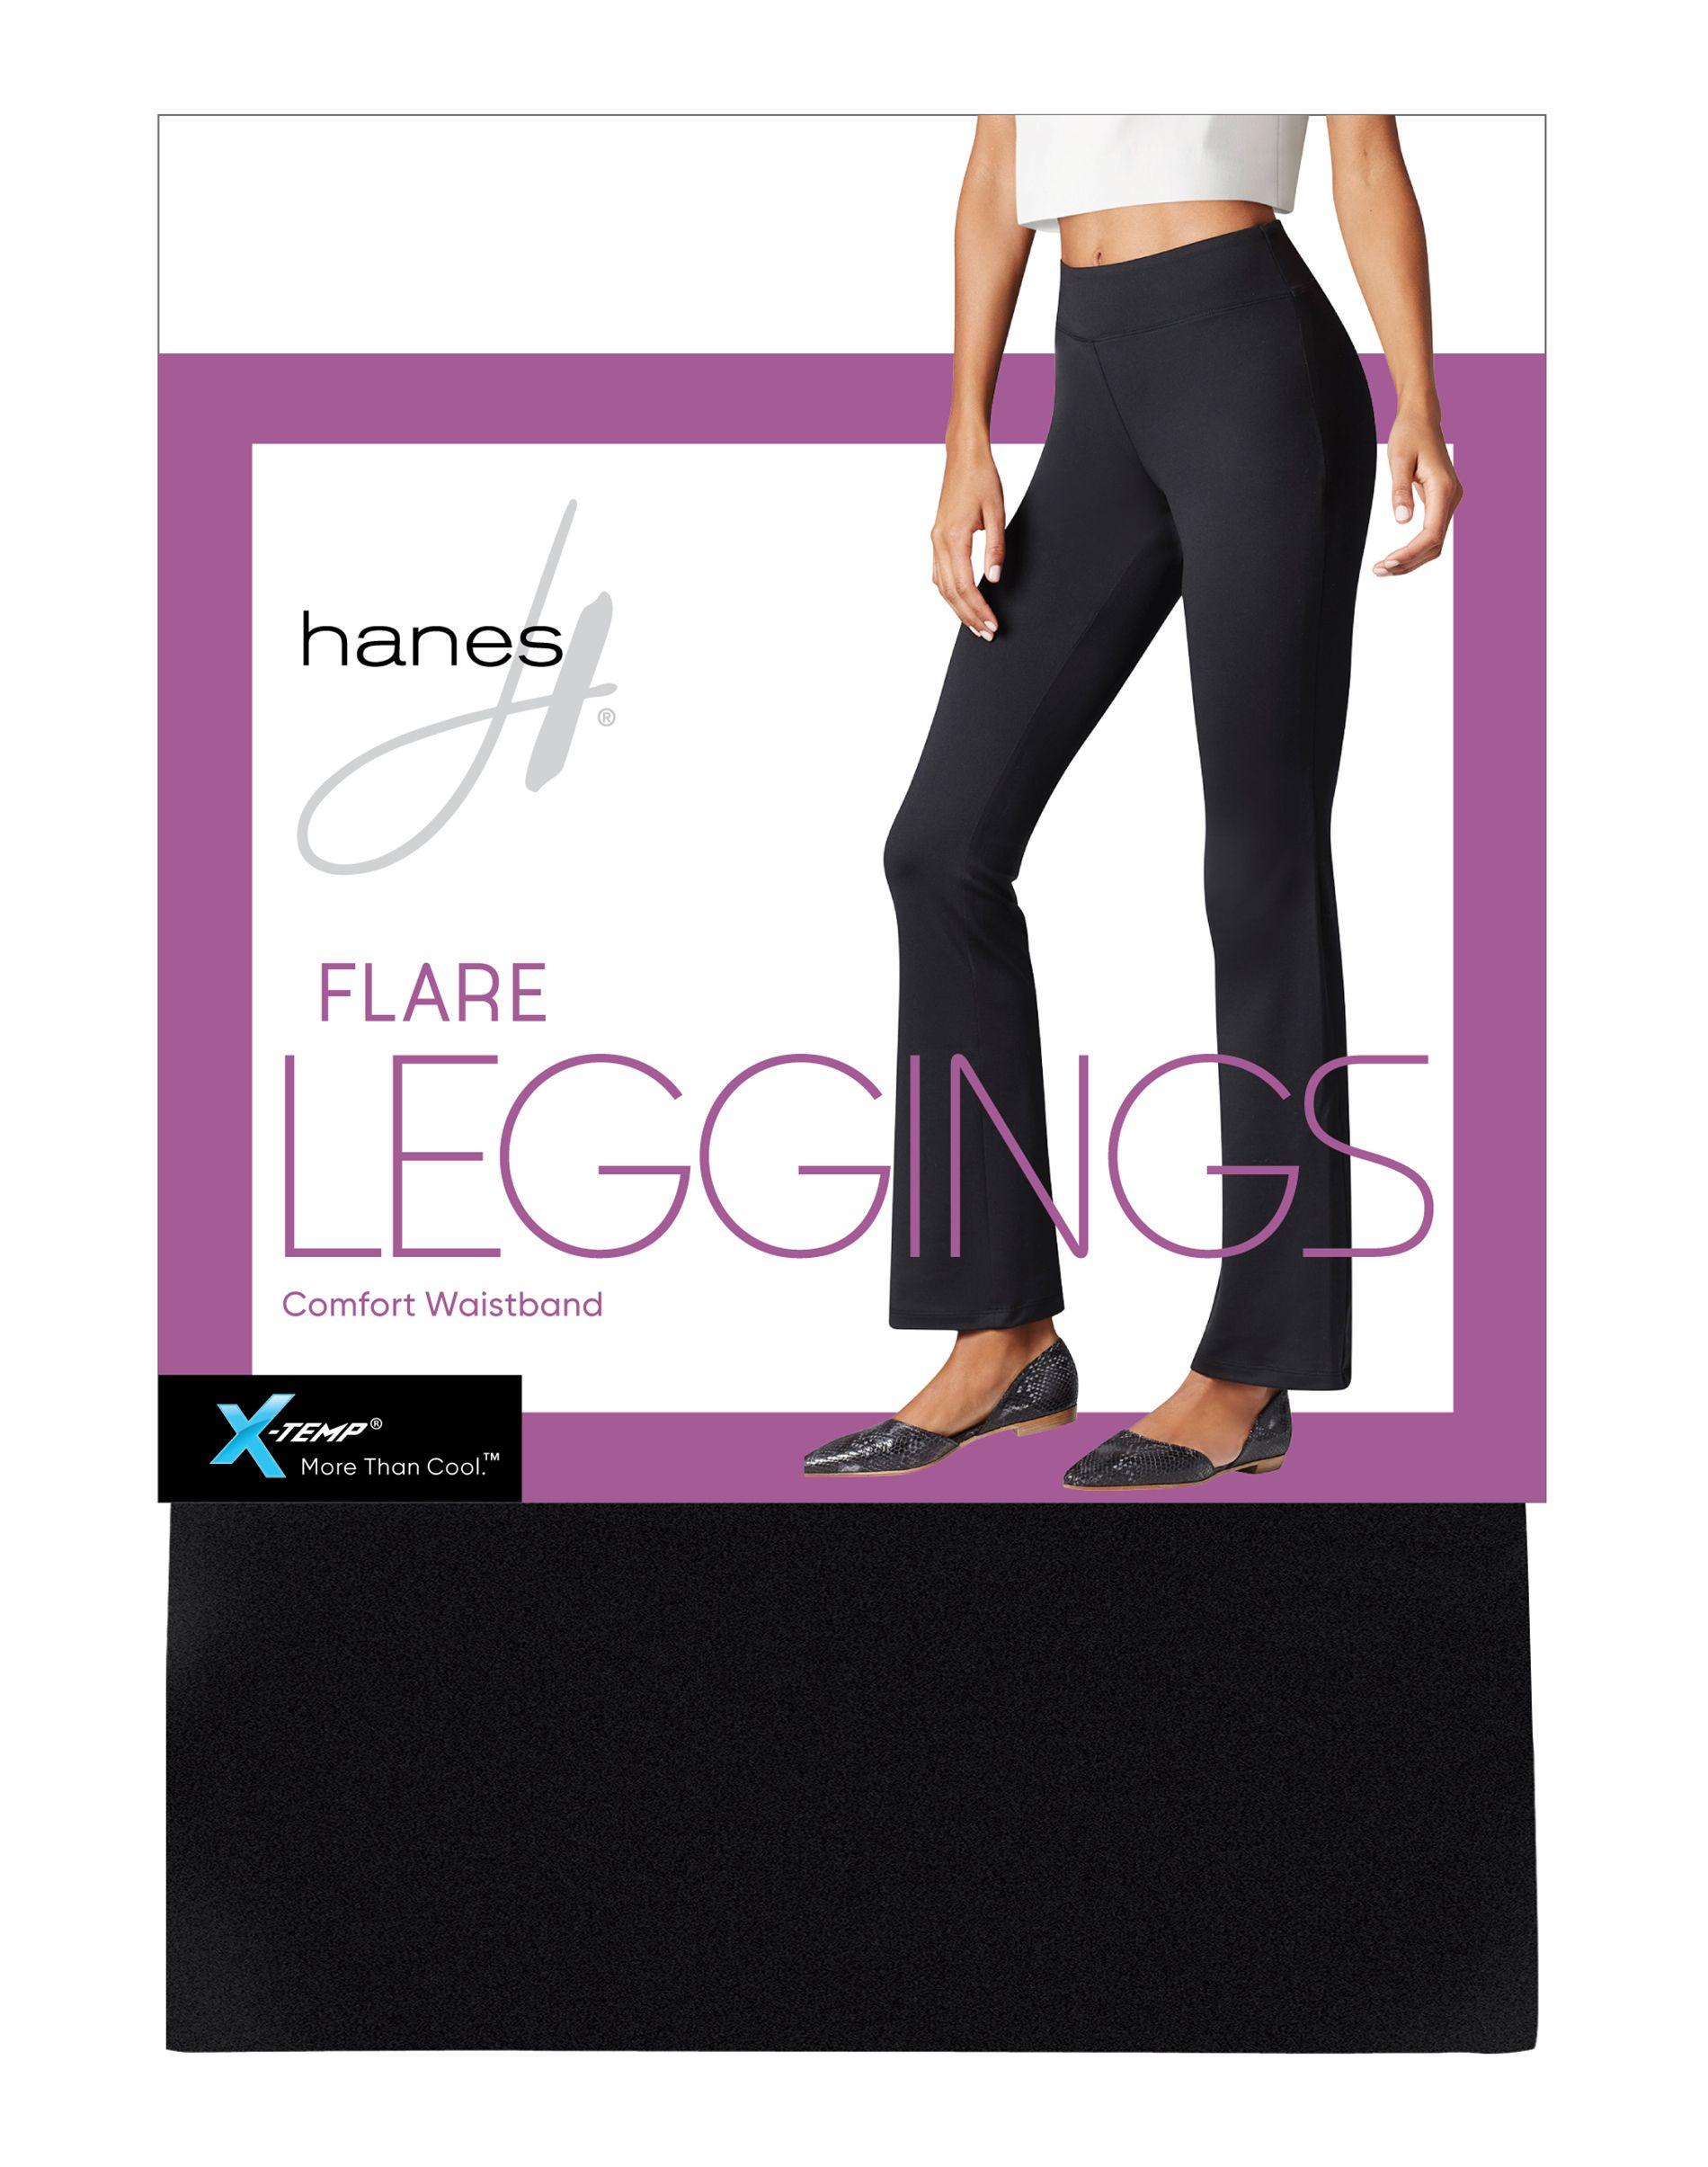 hanes flare leggings women Hanes